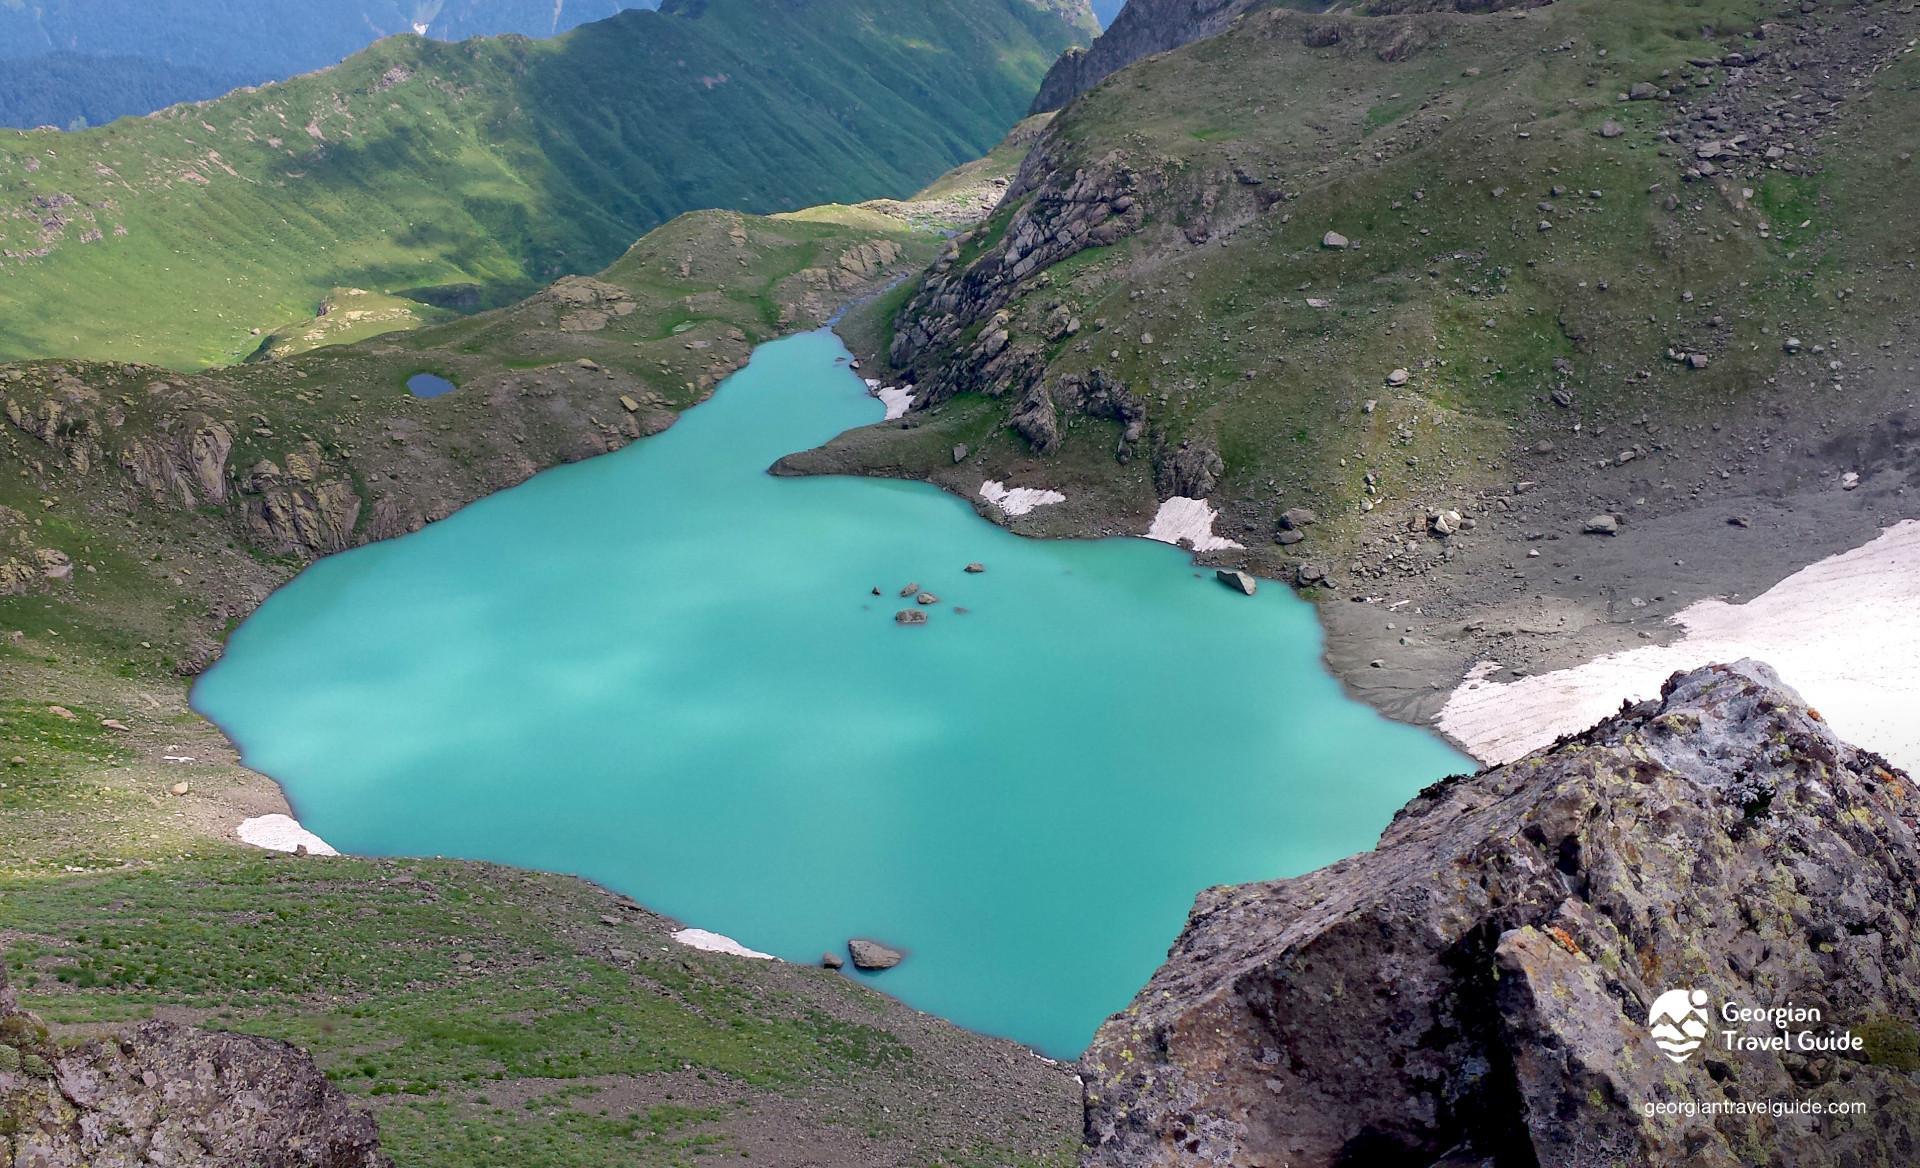 tsakartsqarish tobas tba tsakartsqalish toba lake — Chkhorotsku,Ge